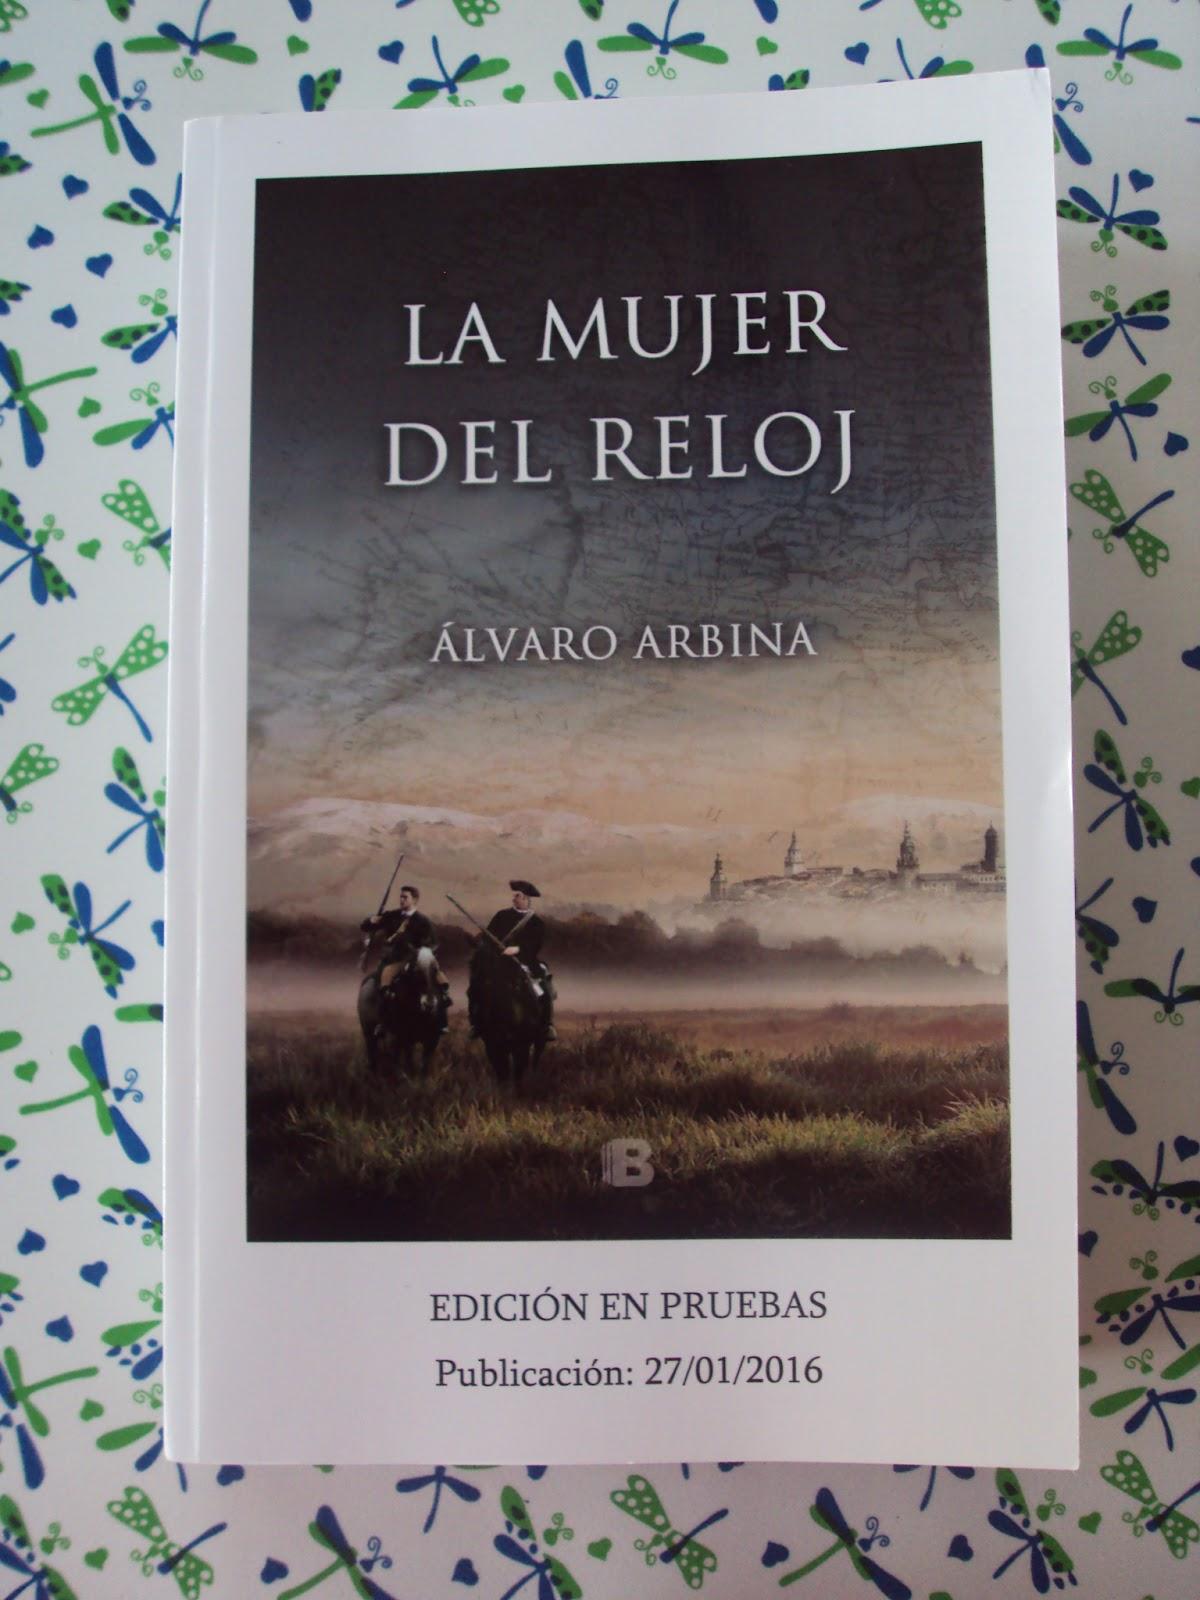 10d56c96d6d2 La mujer del reloj - Álvaro Arbina